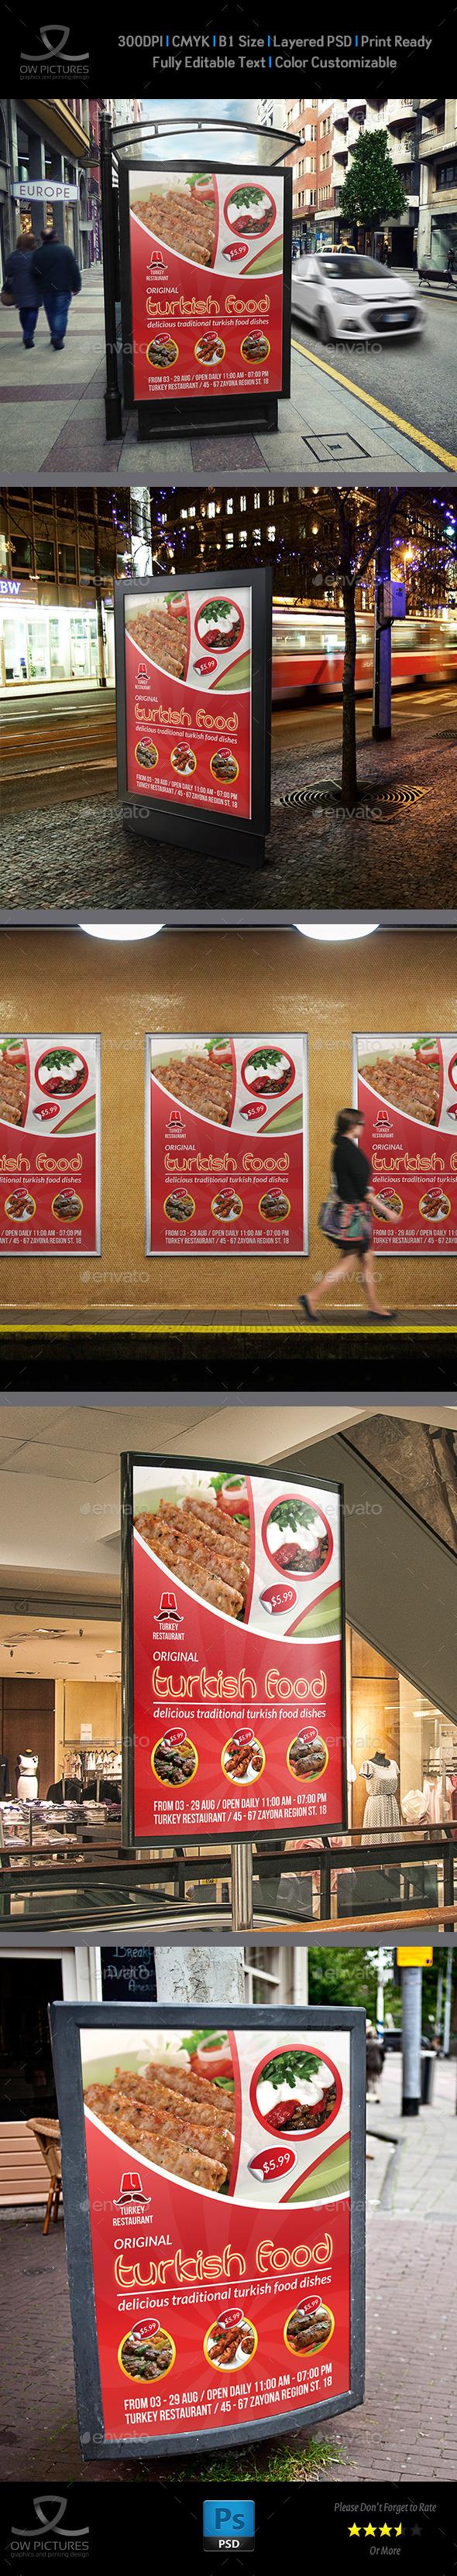 Turkish Restaurant Poster Template - Signage Print Templates